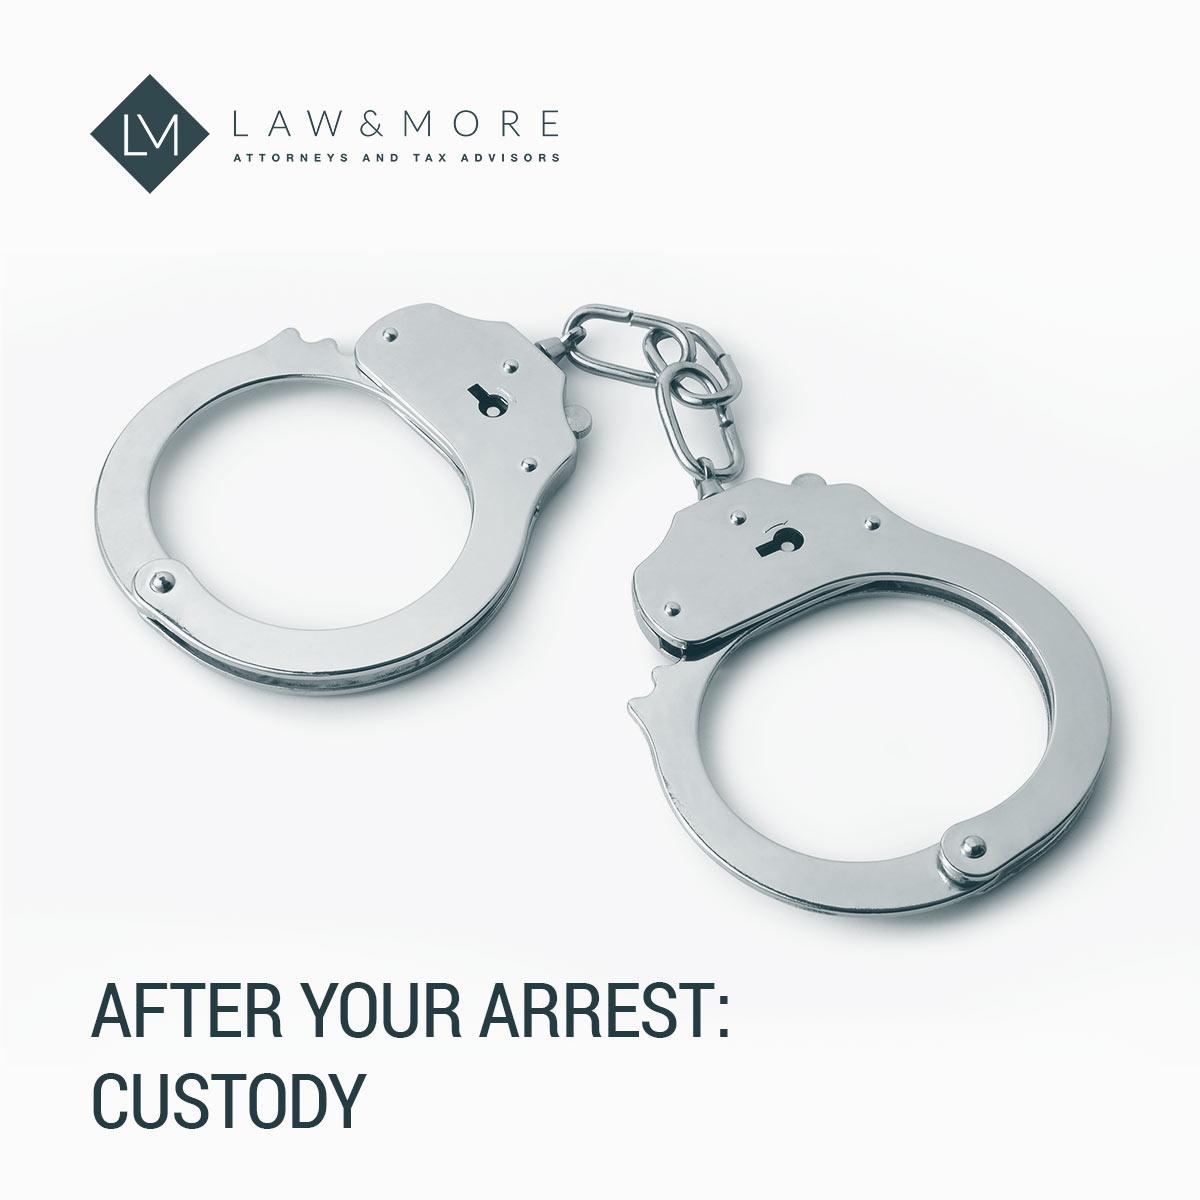 Pas arrestimit tuaj: kujdestari